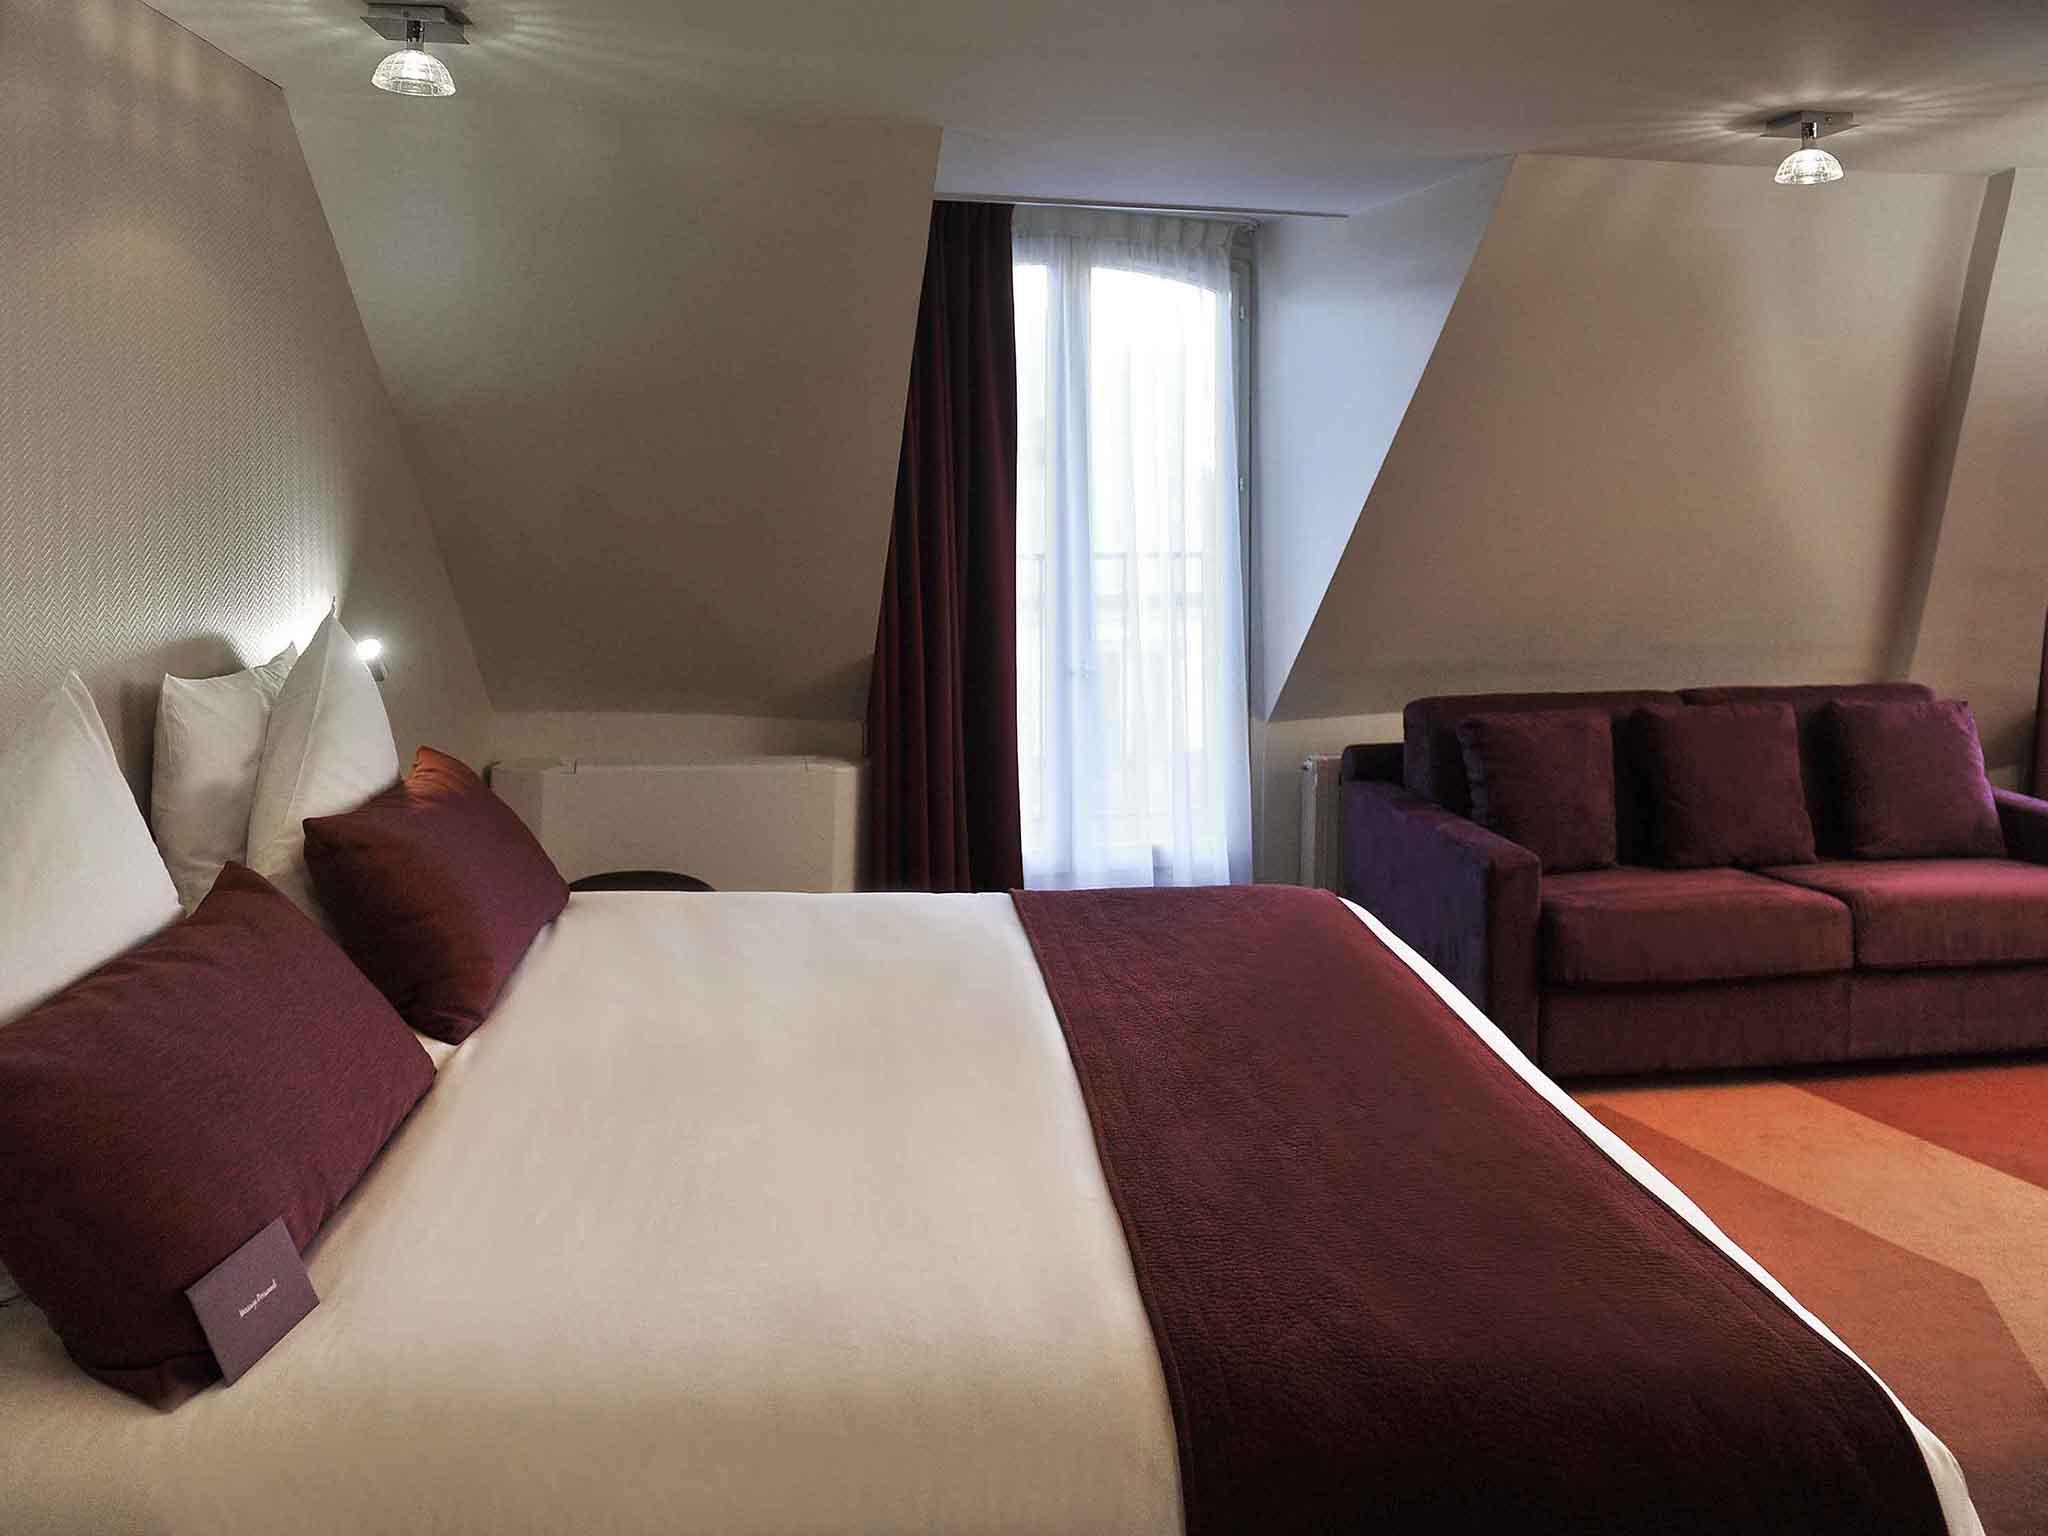 Hotel – Hotel Mercure Parijs Opéra Lafayette